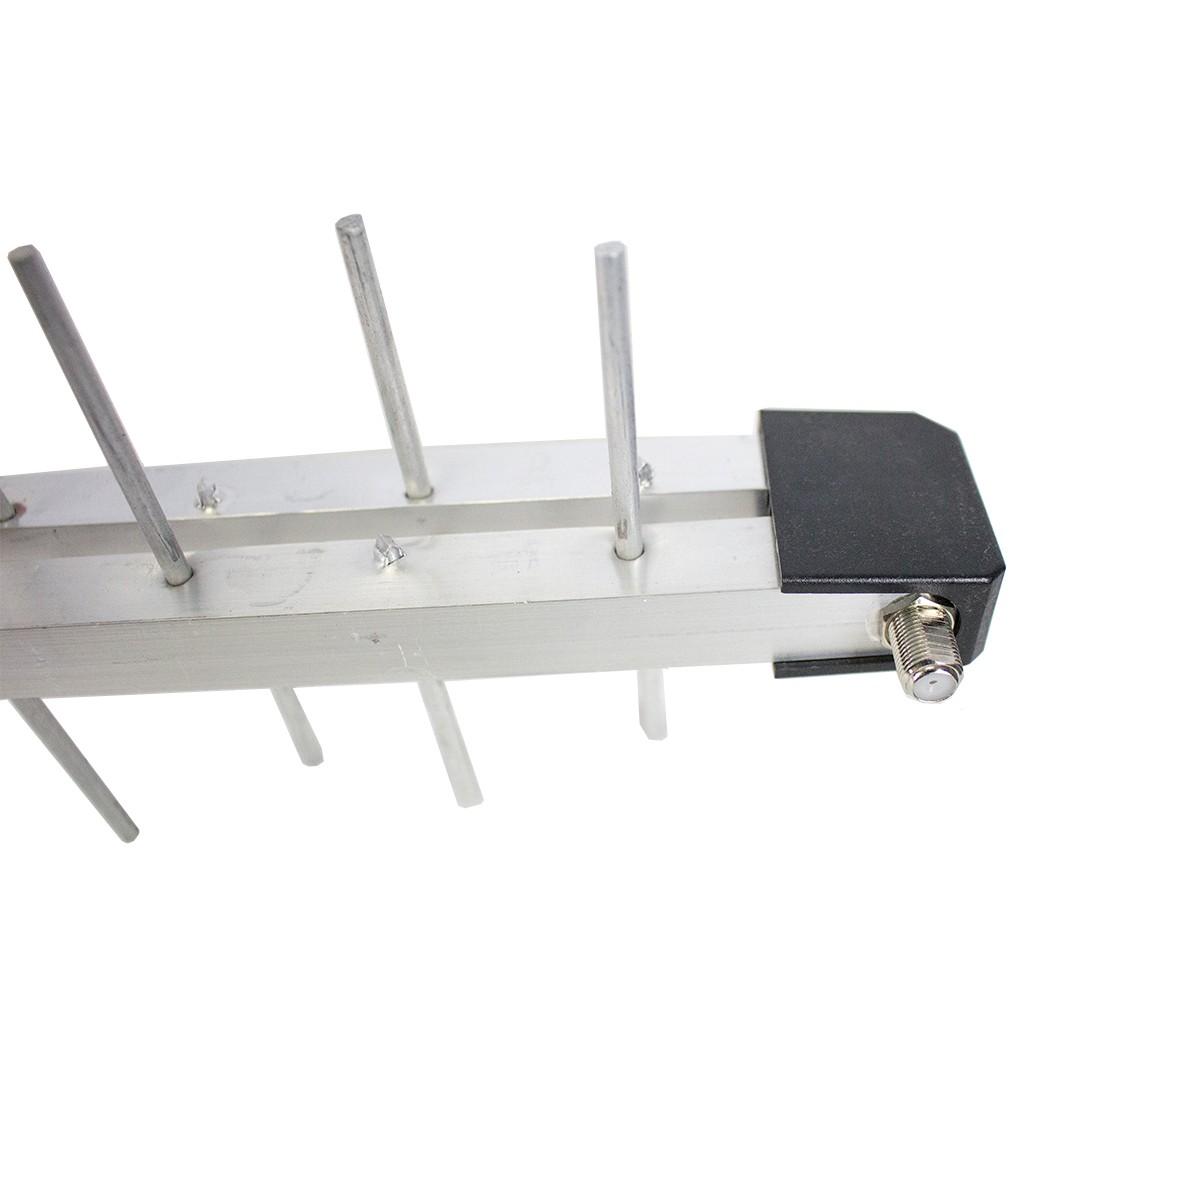 Antena Externa p/ TV UHF/3D/HDTV - Log Periódica PQ 45 1300 HD ProEletronic